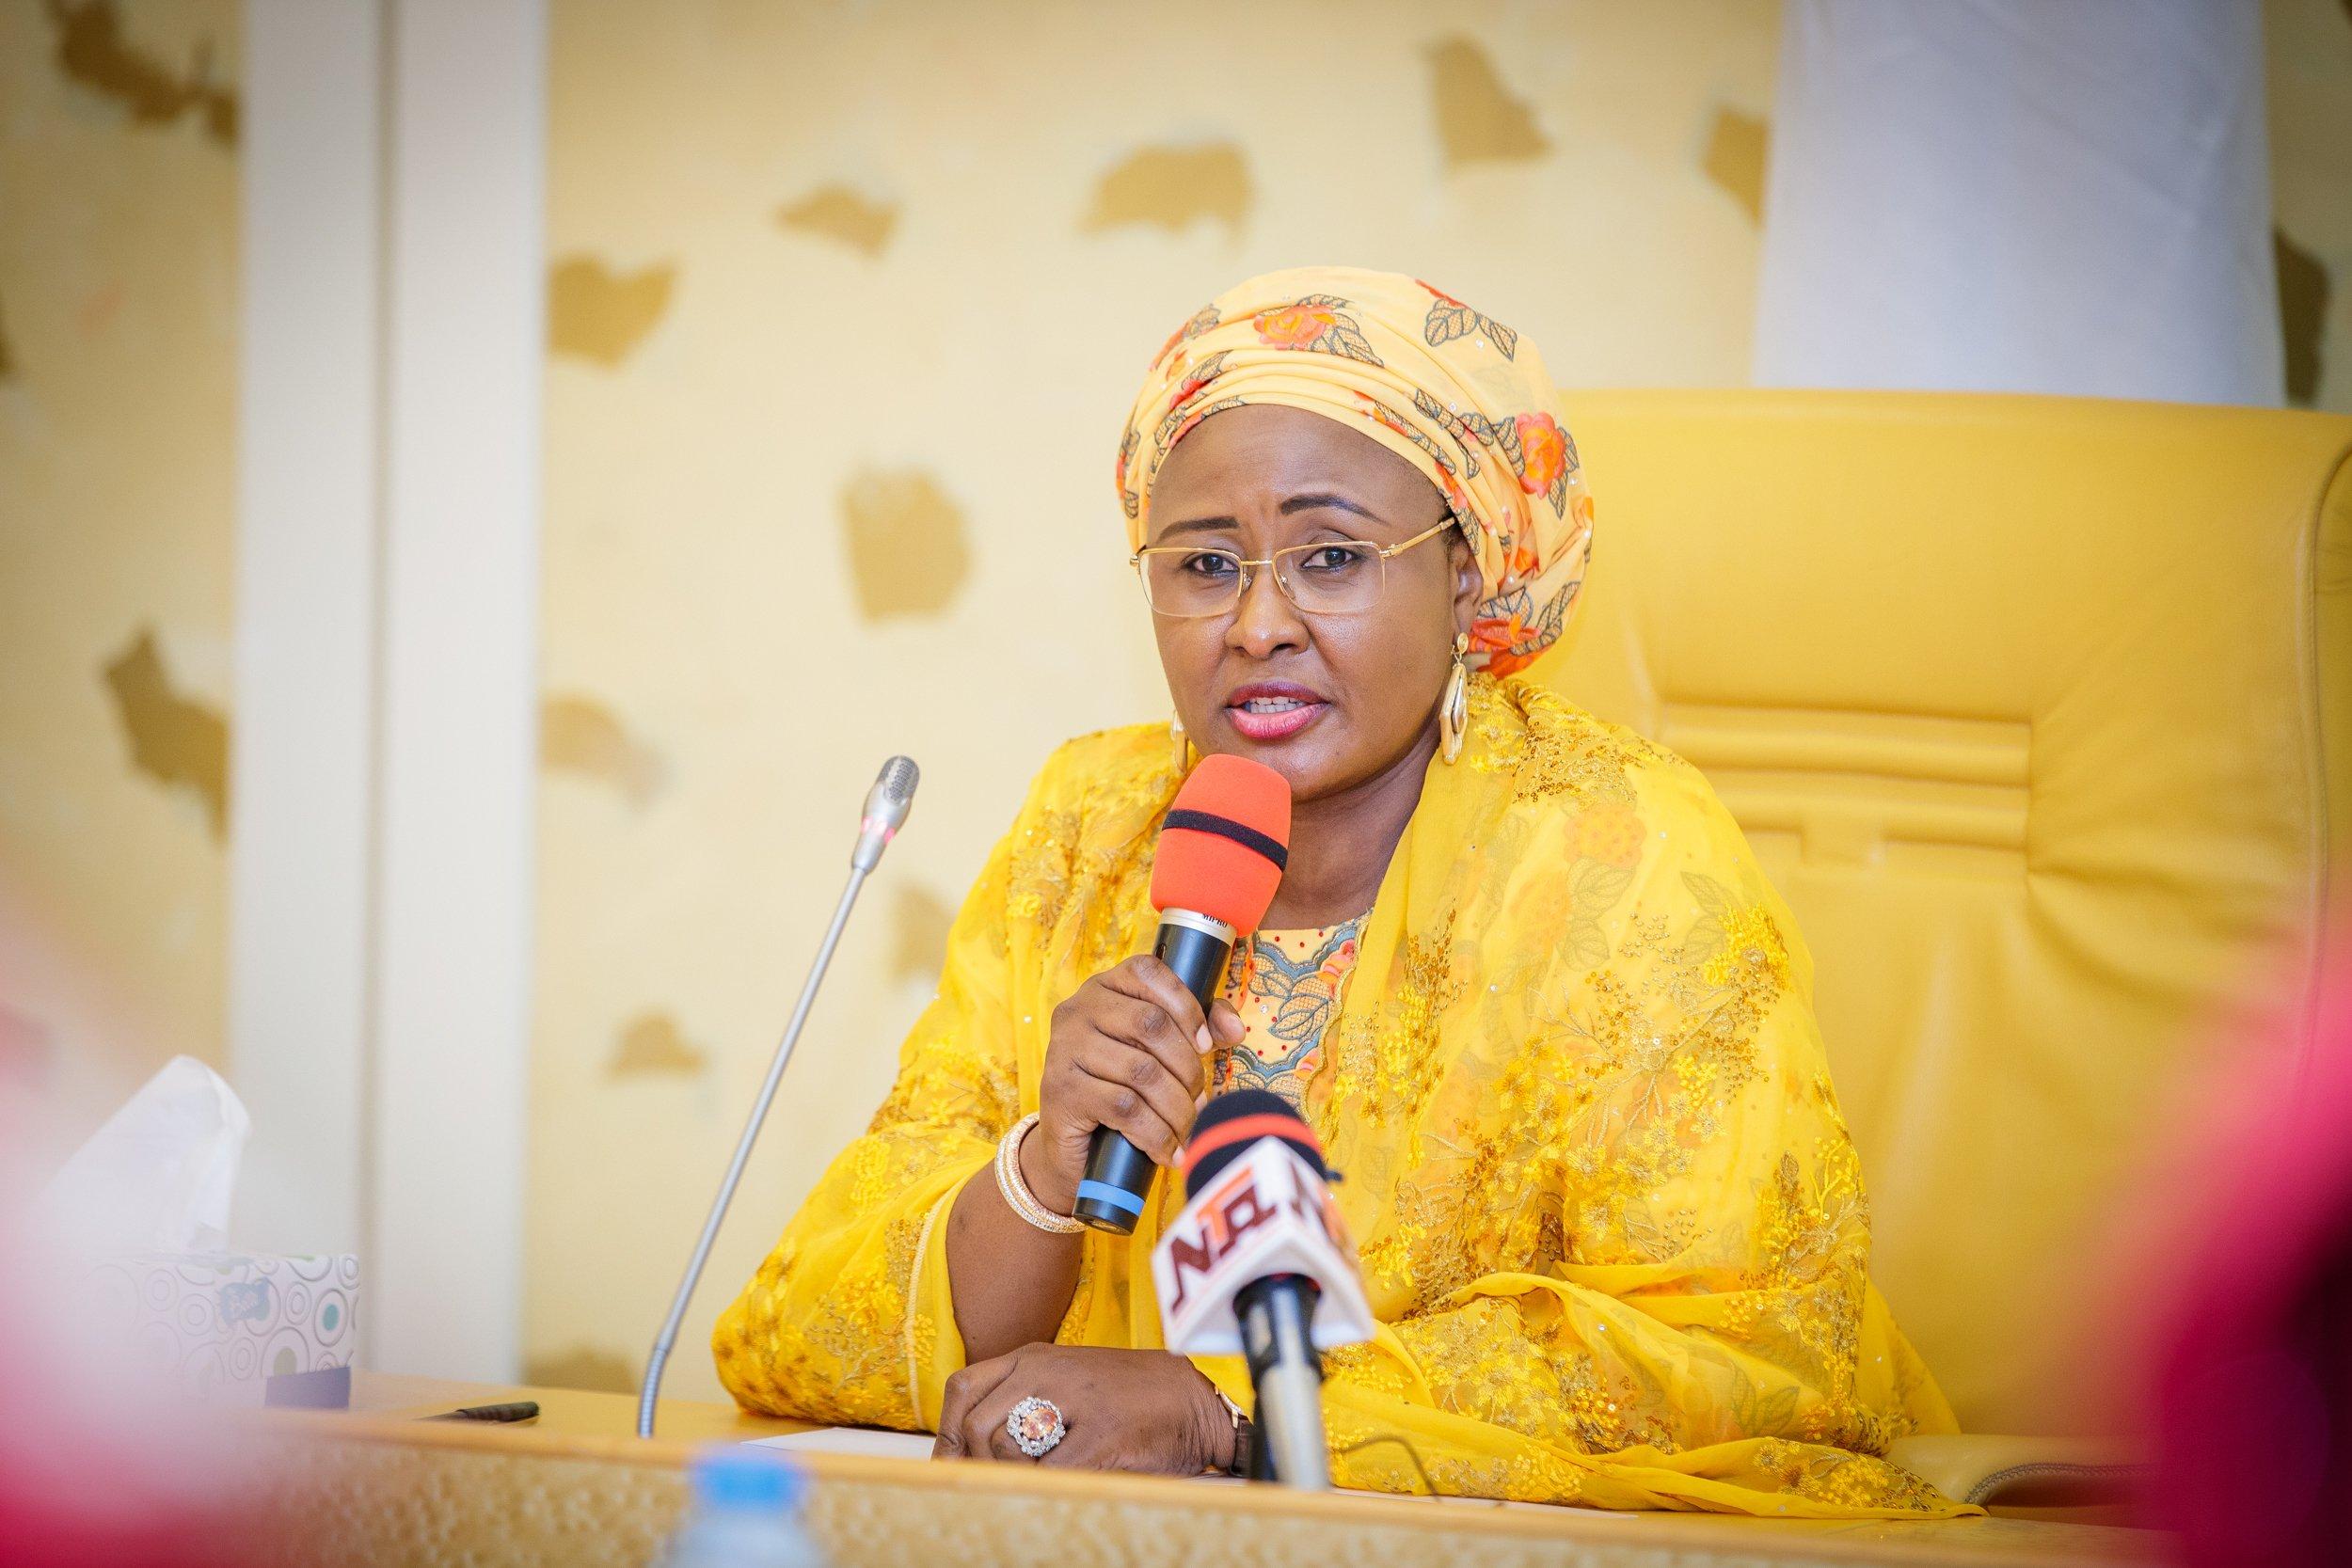 Child Malnutrition Scourge Must End In Nigeria -Aisha Buhari